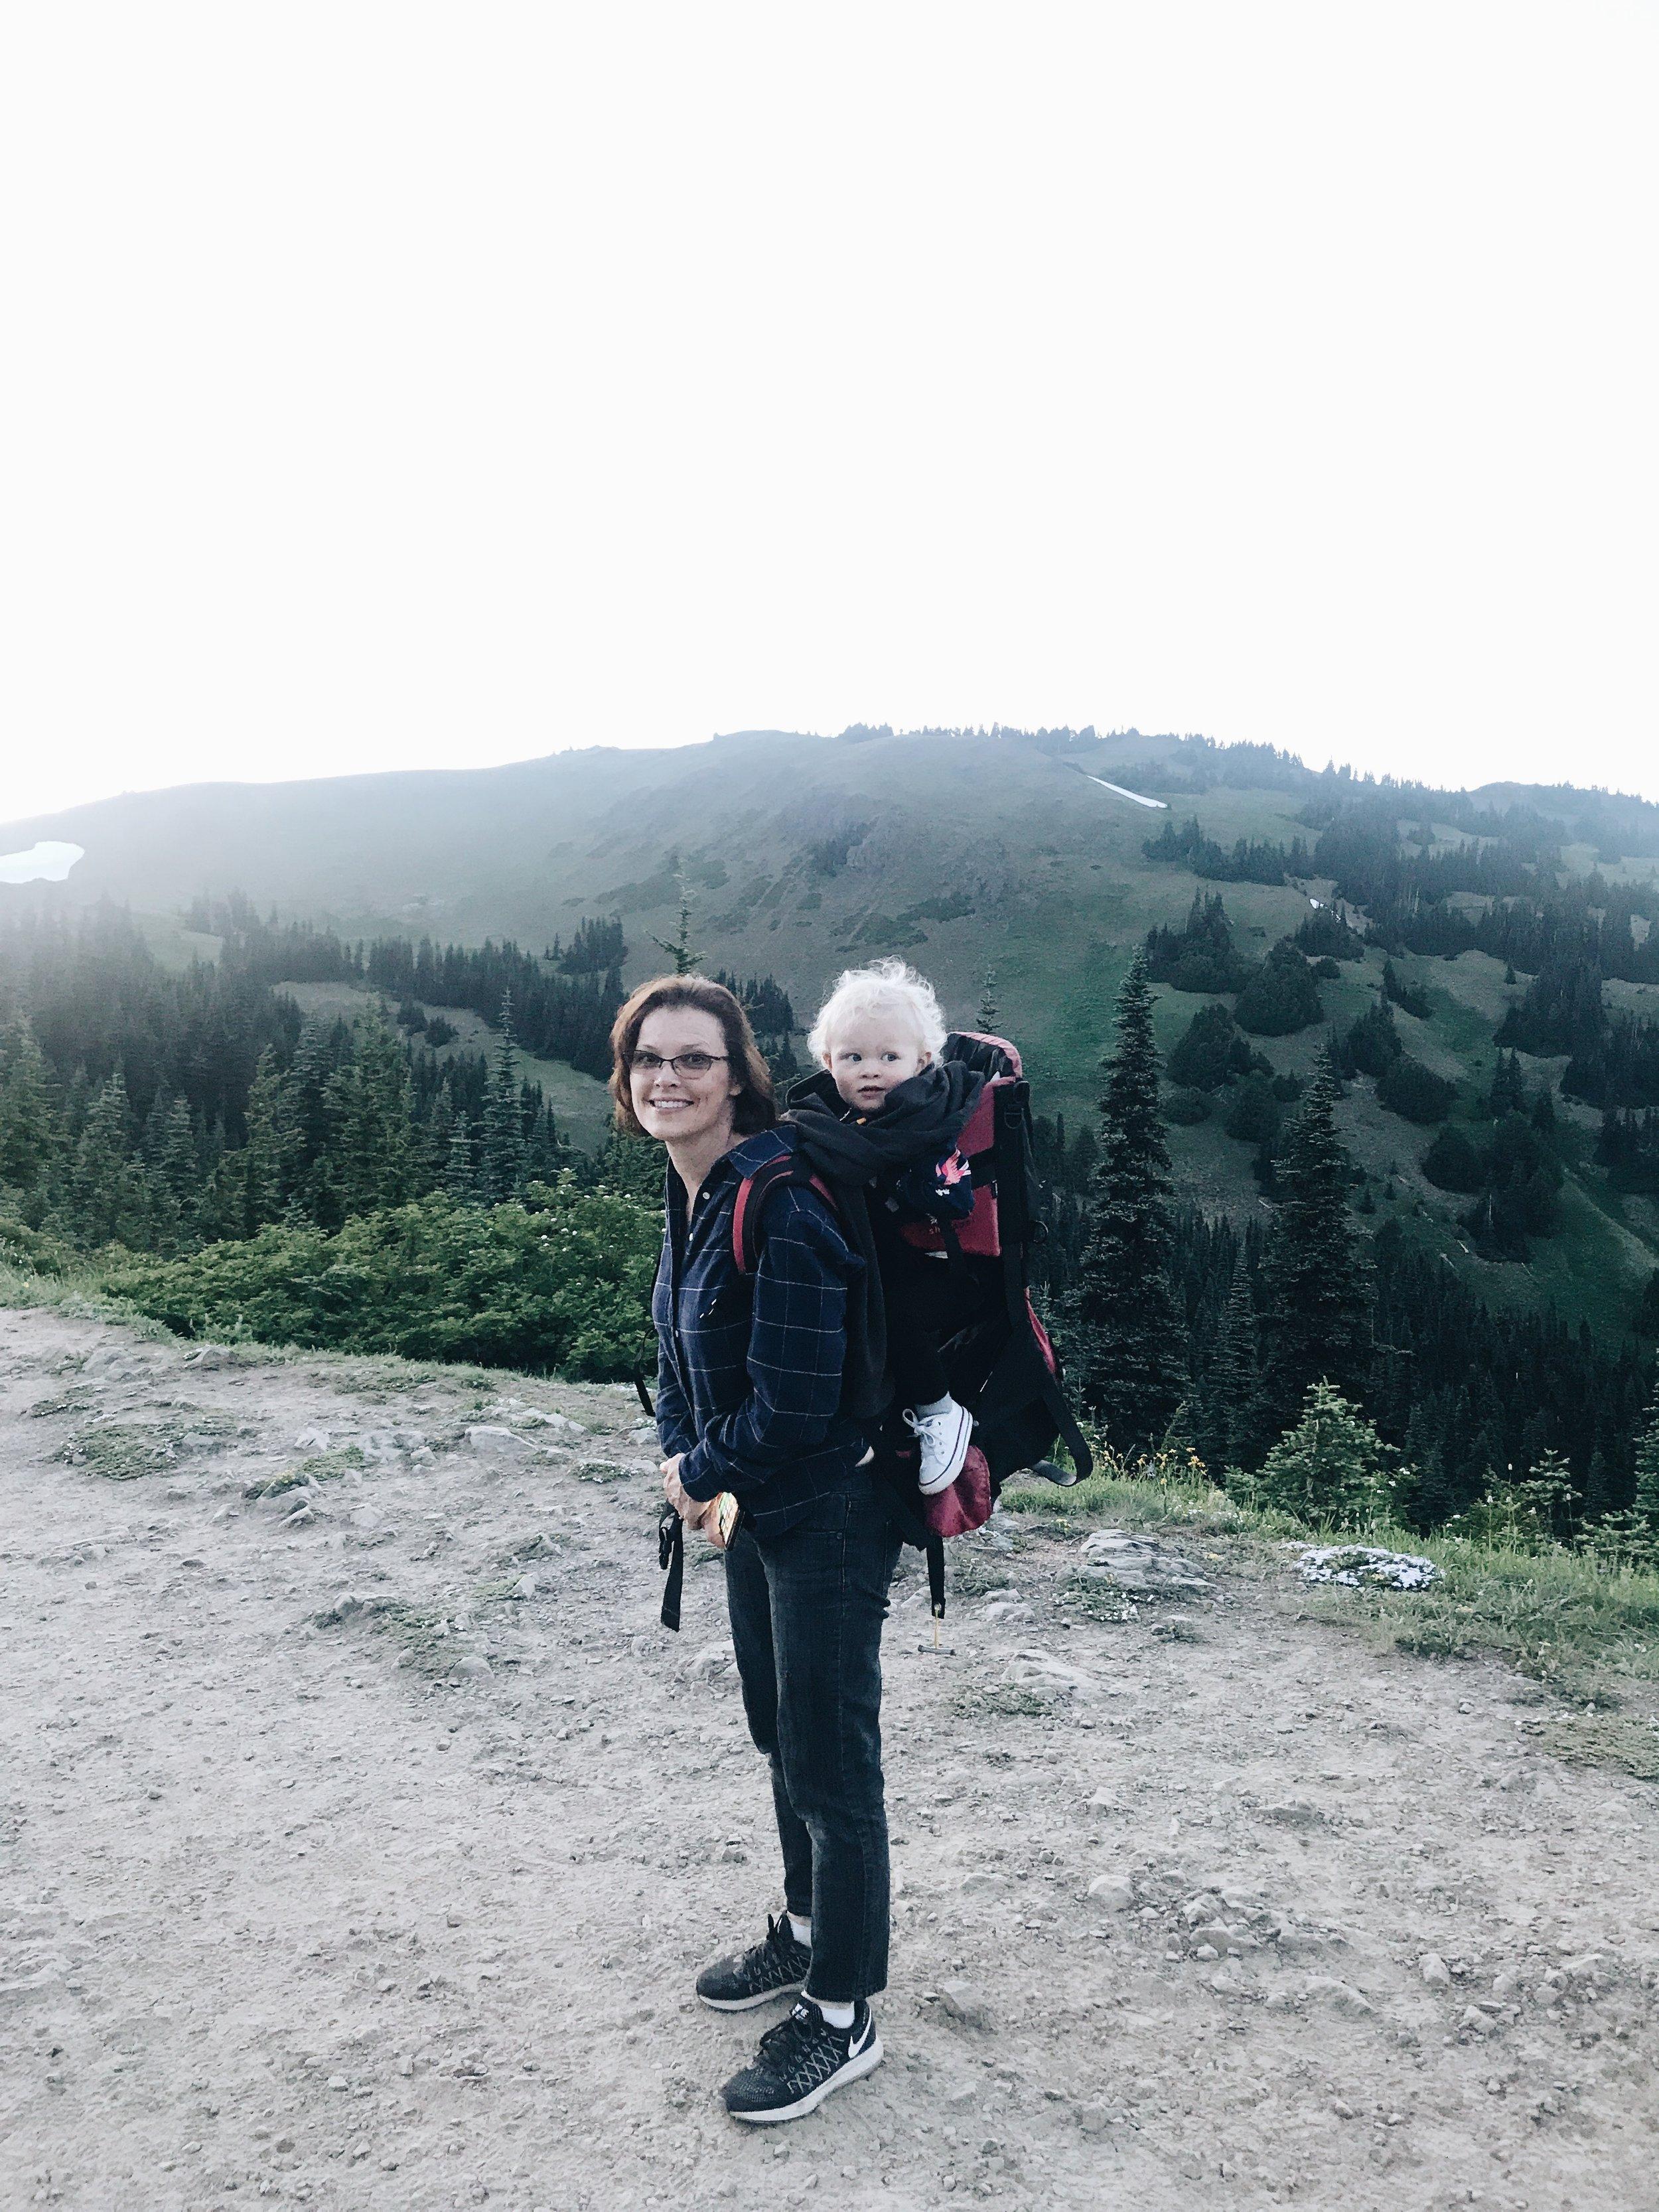 My mom and my niece Ezra.